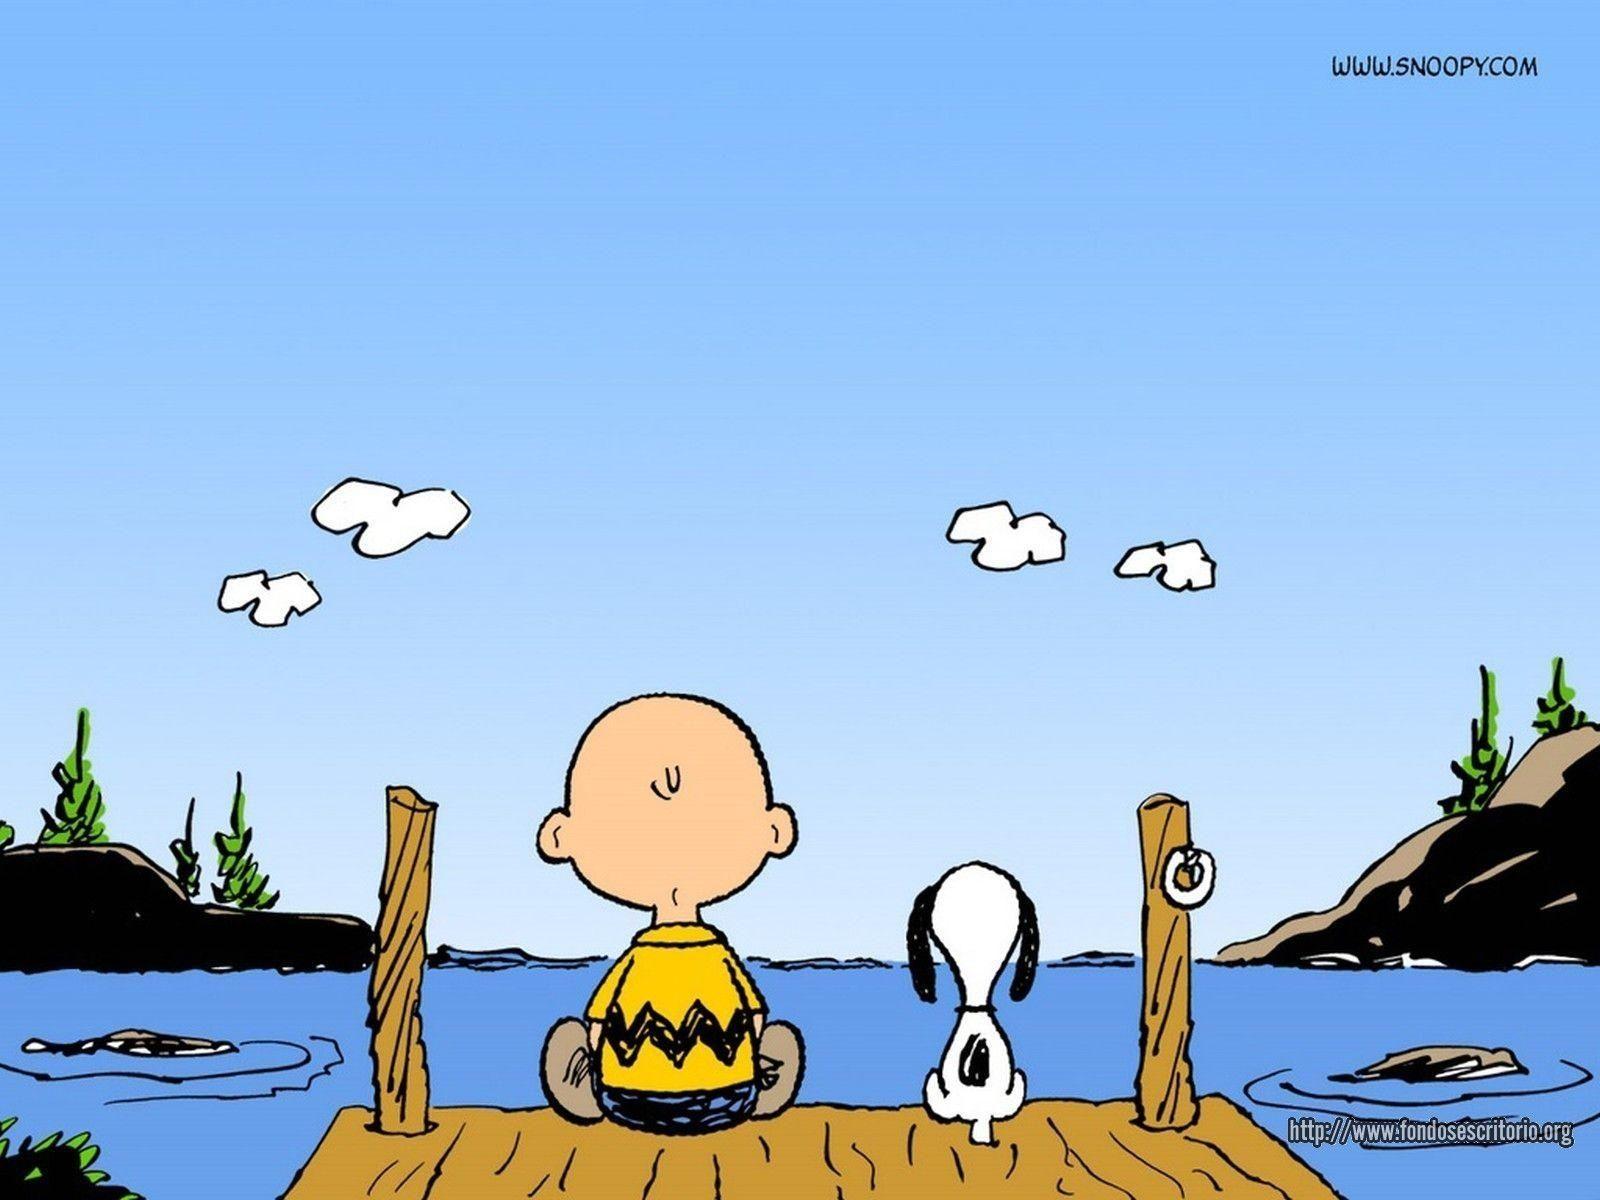 10 Best Snoopy Wallpaper For Desktop FULL HD 1080p For PC